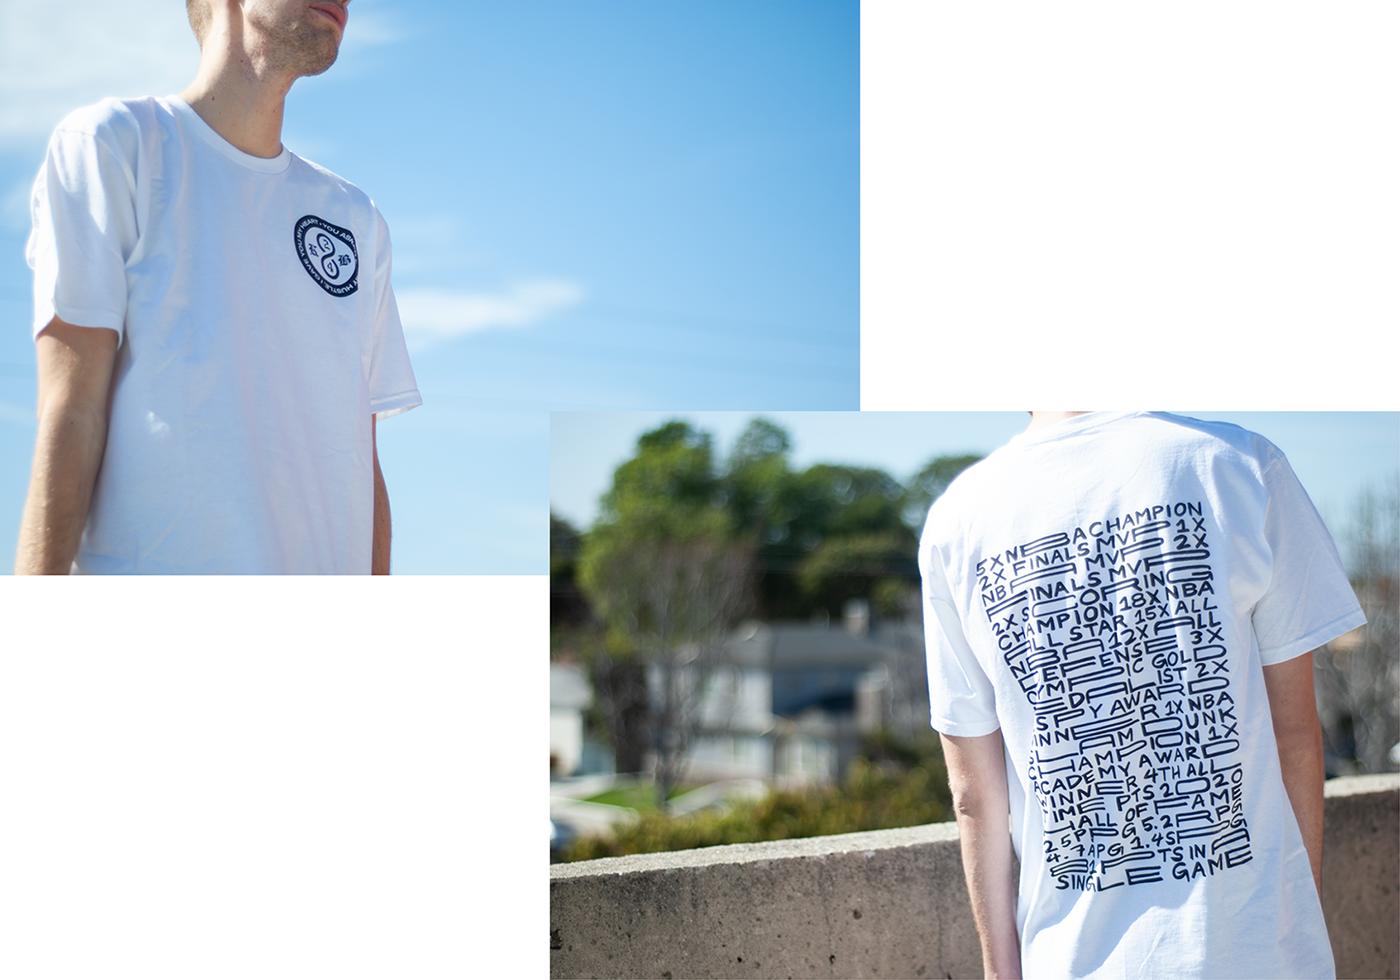 kobe bryant gianna shirt graphic design rip in memoriam los angeles lakers nba basketball